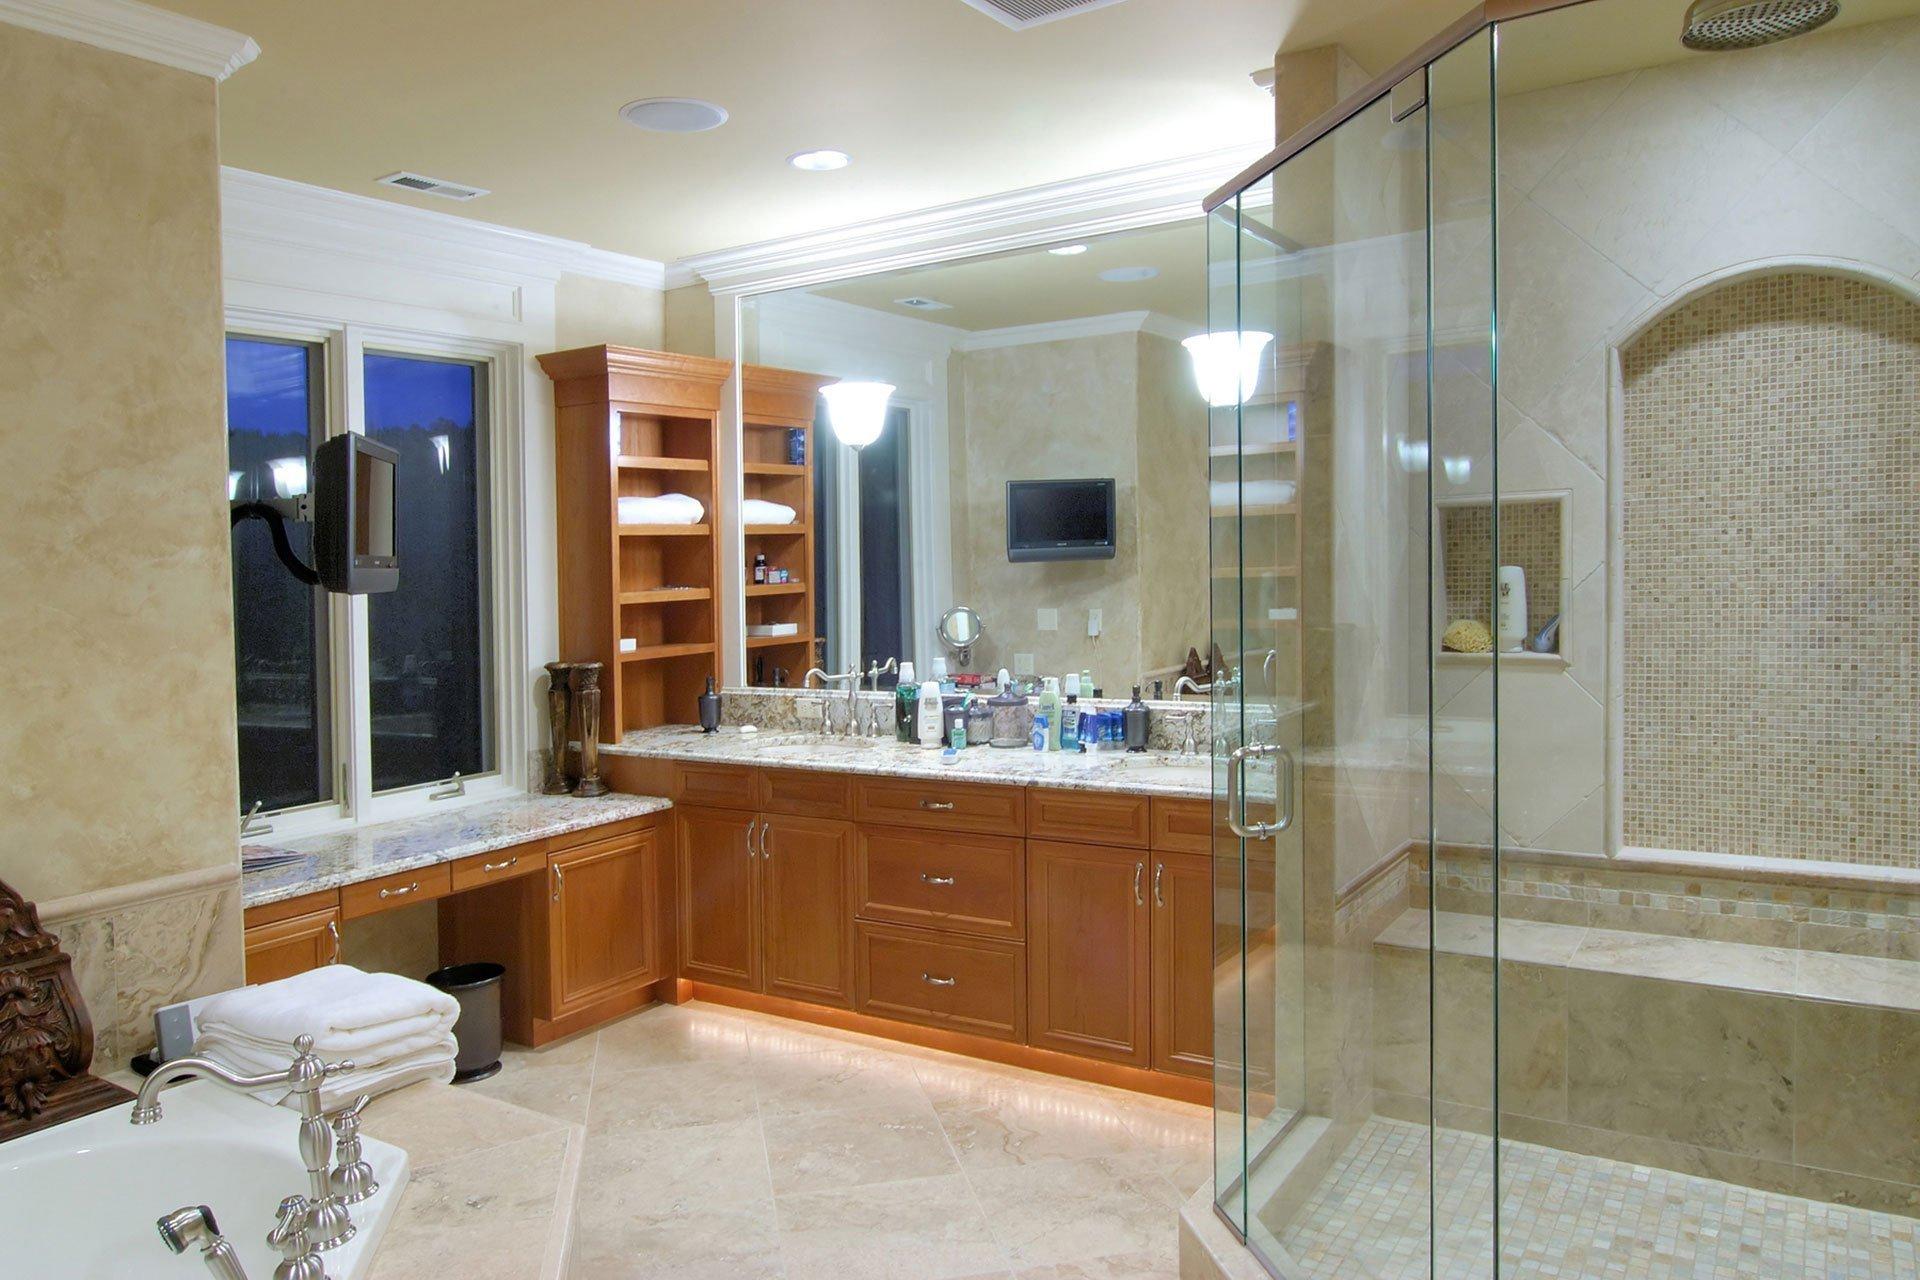 Granite Countertops For Kitchens In Buffalo Ny Custom Countertops Cfm Stone Surfaces